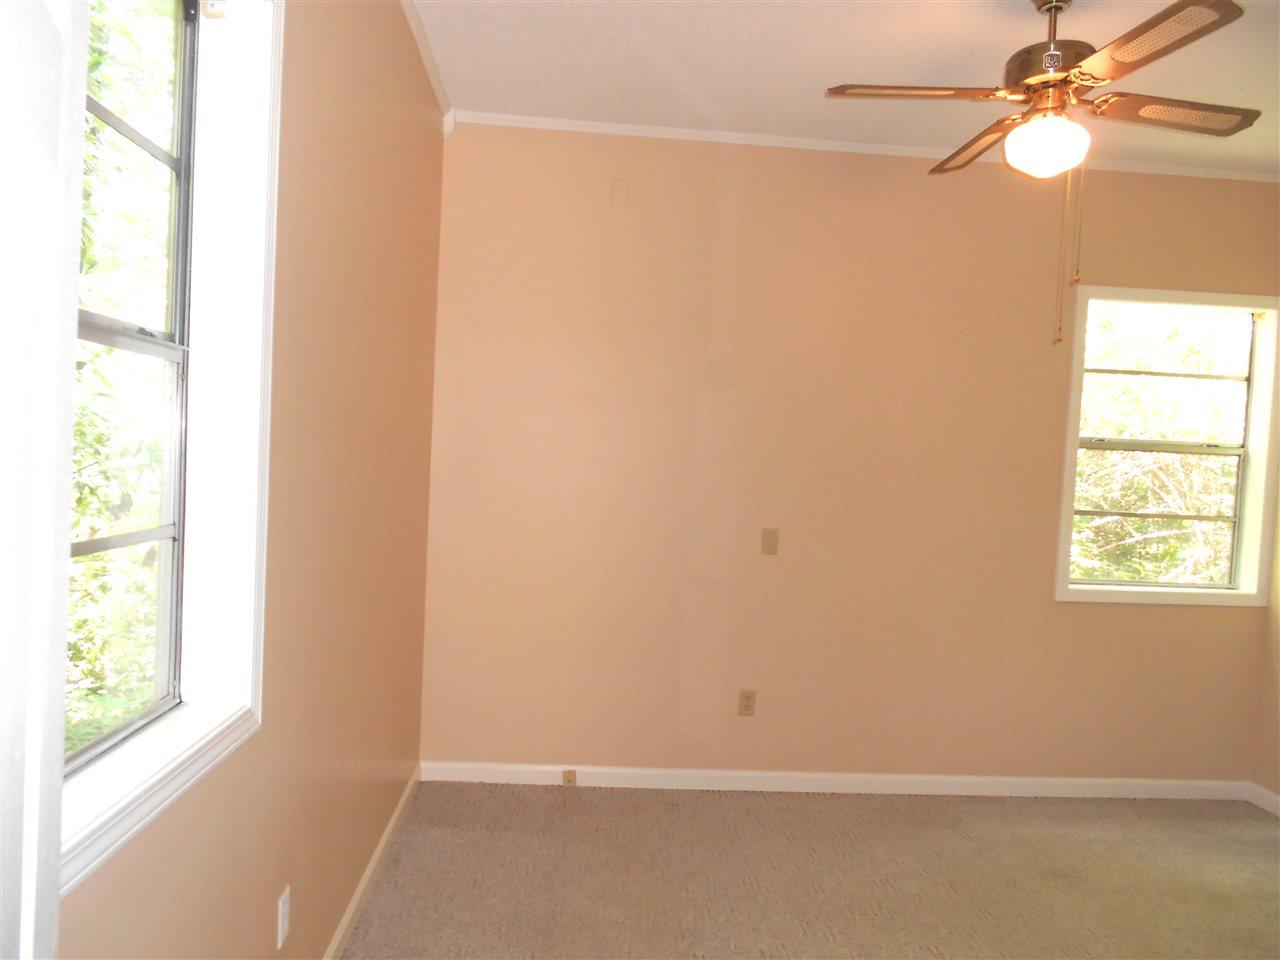 345 Locust Grove Memphis, TN 38018 - MLS #: 10010432